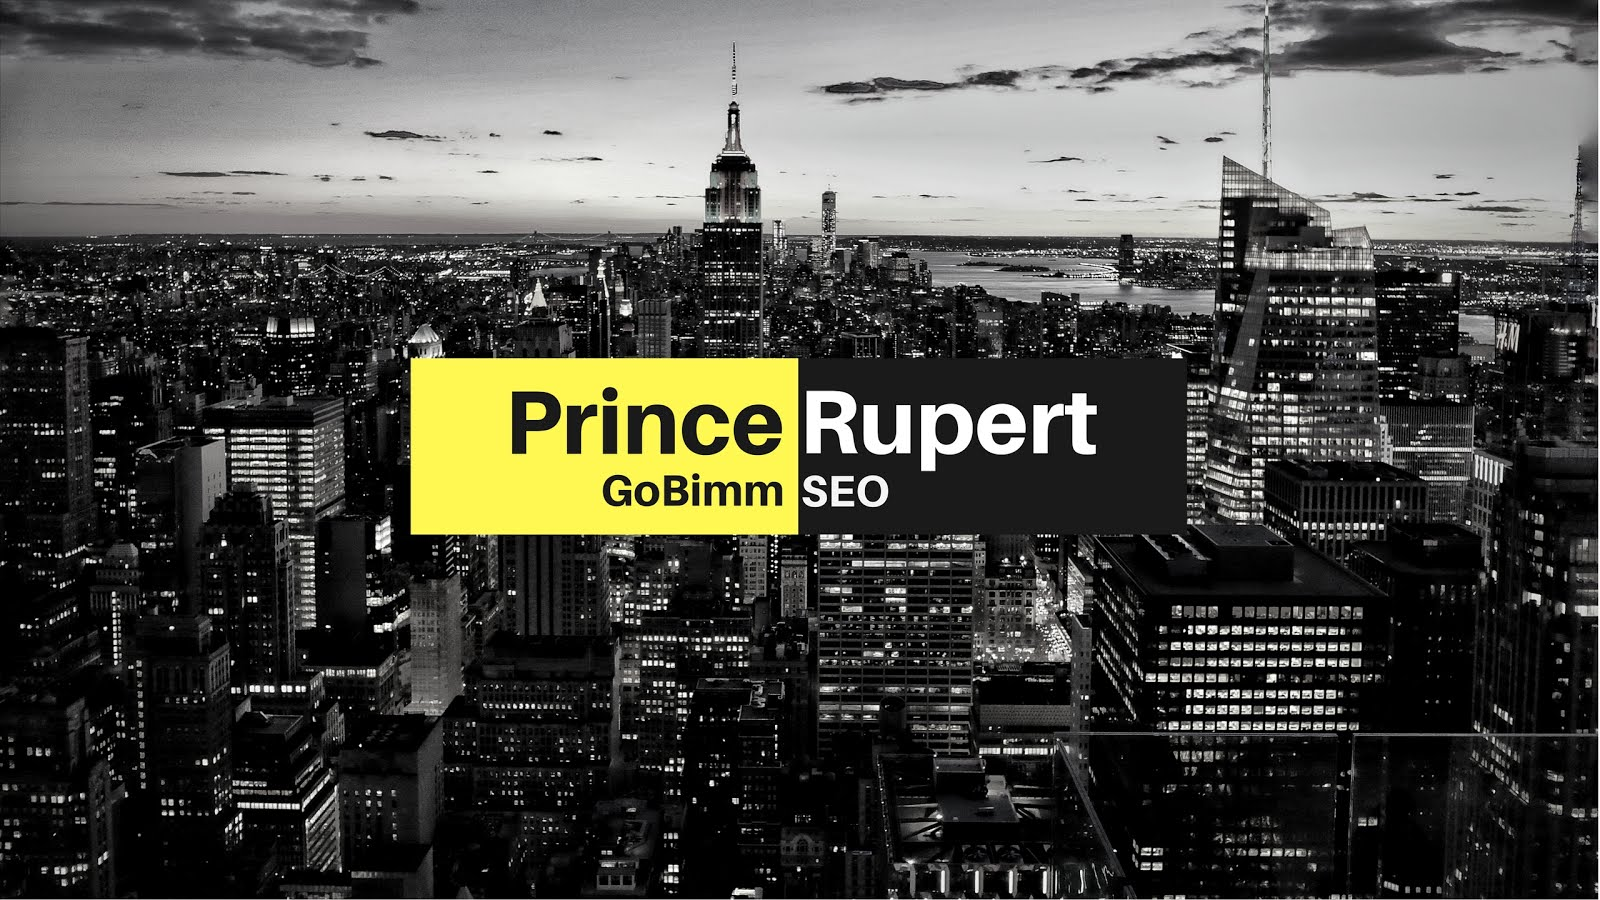 Prince Rupert SEO